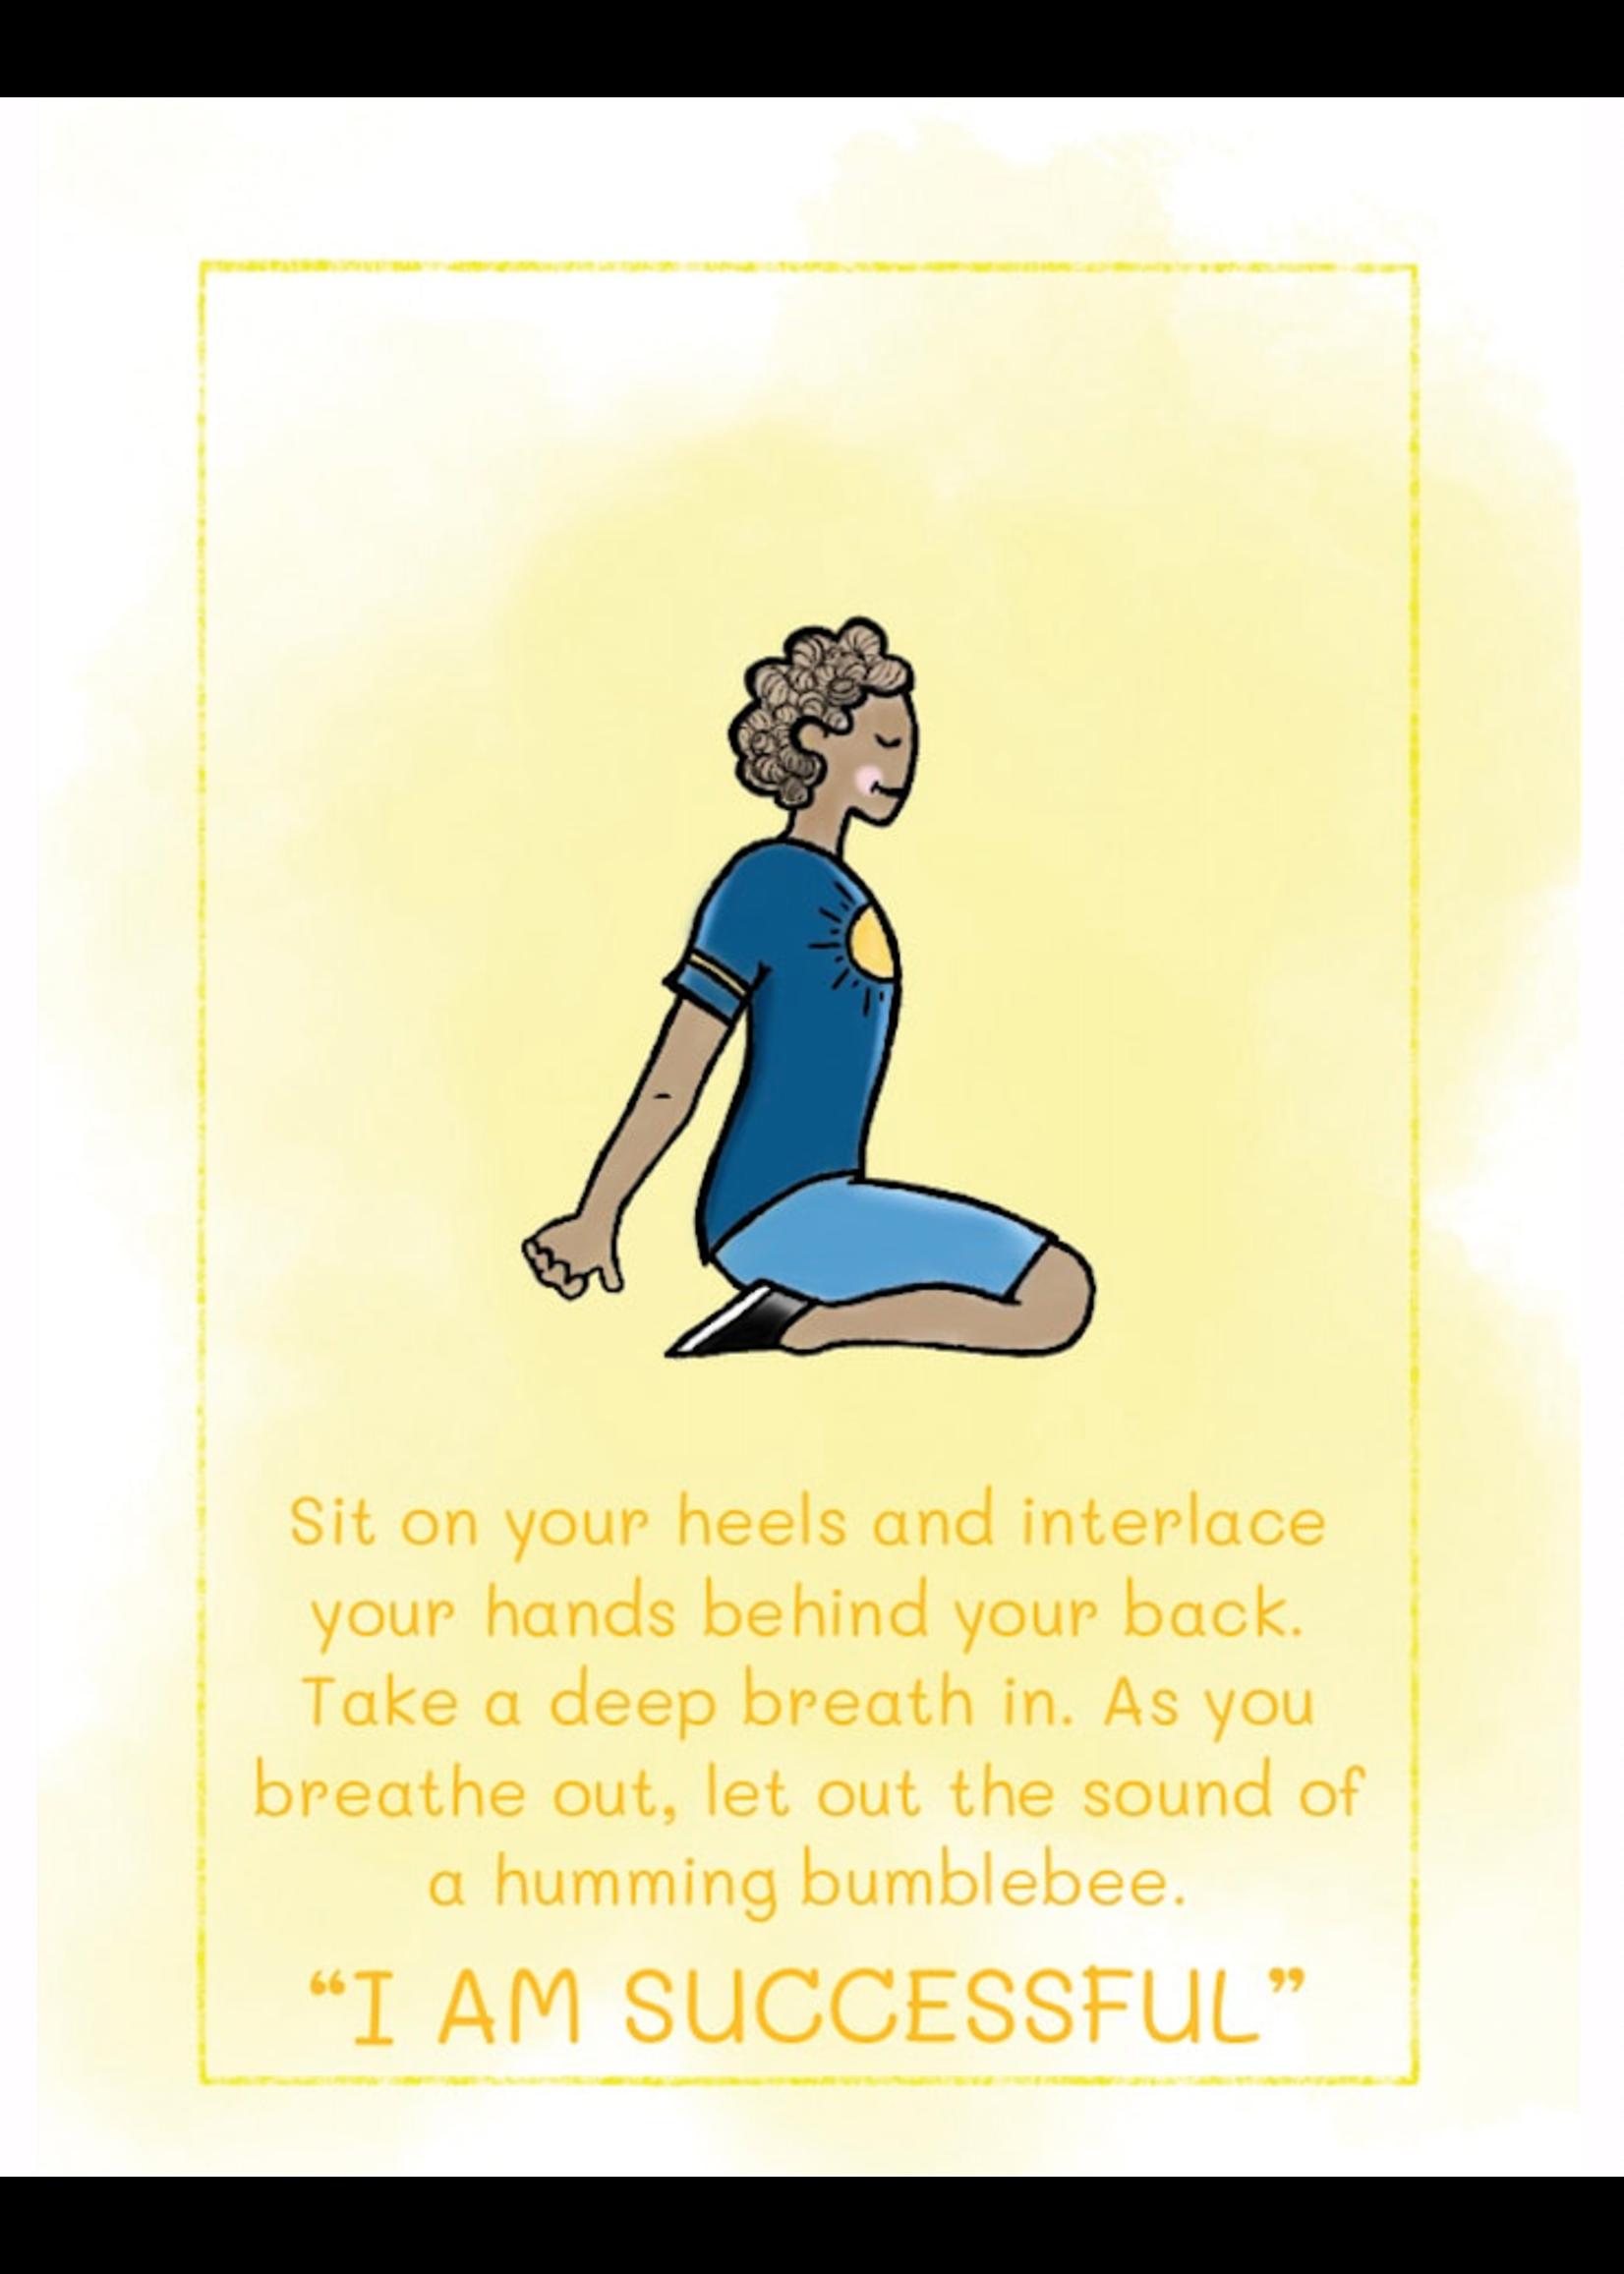 littlewondersyoga Little Wonders Yoga, 3 Sisters Yoga Cards For Kids